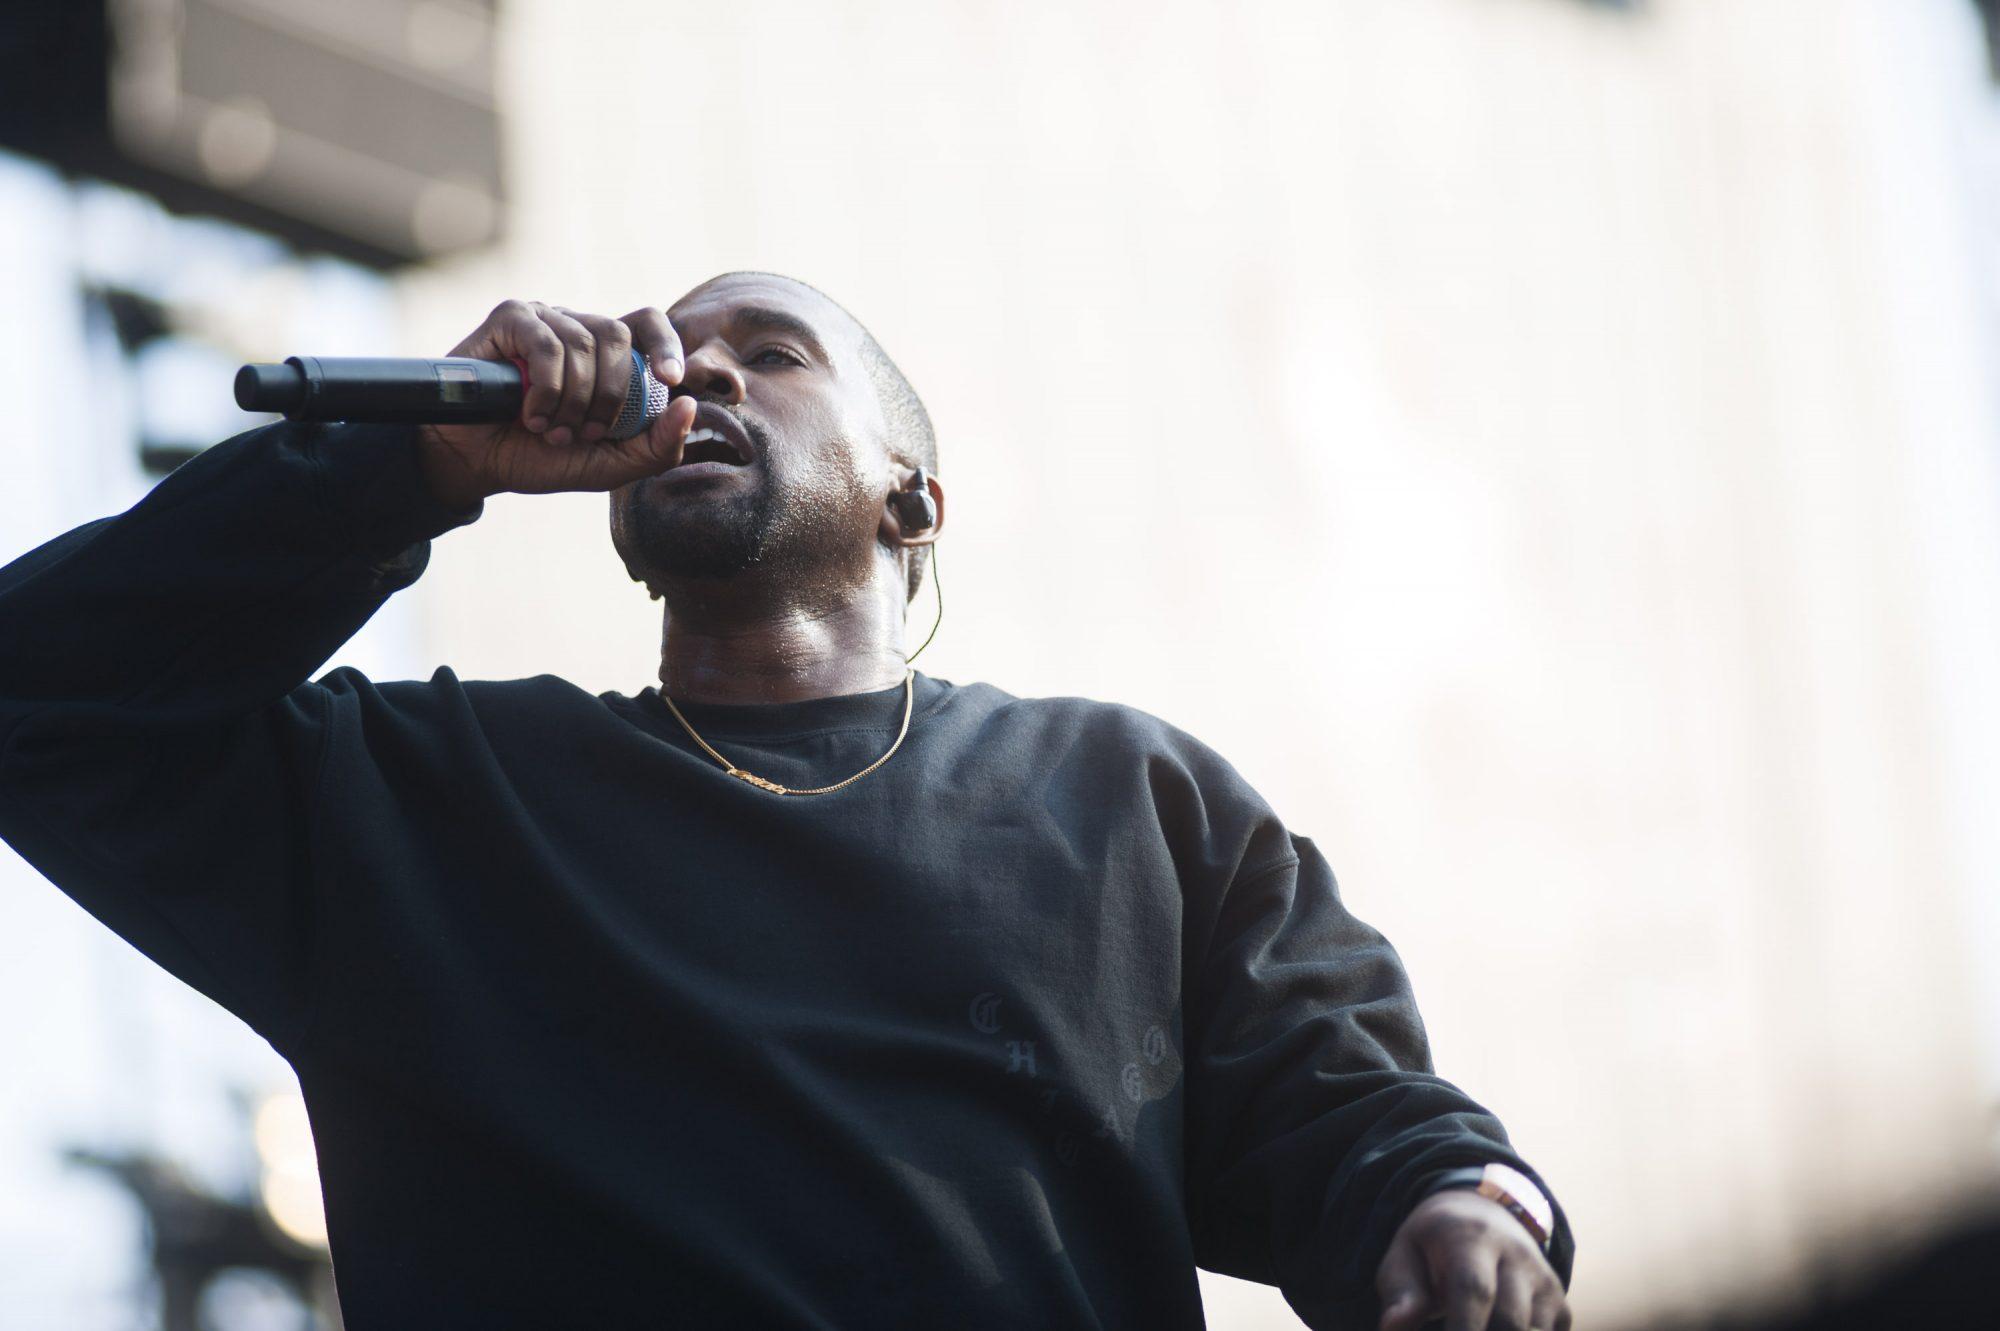 Kanye West #IfSlaveryWereAChoice